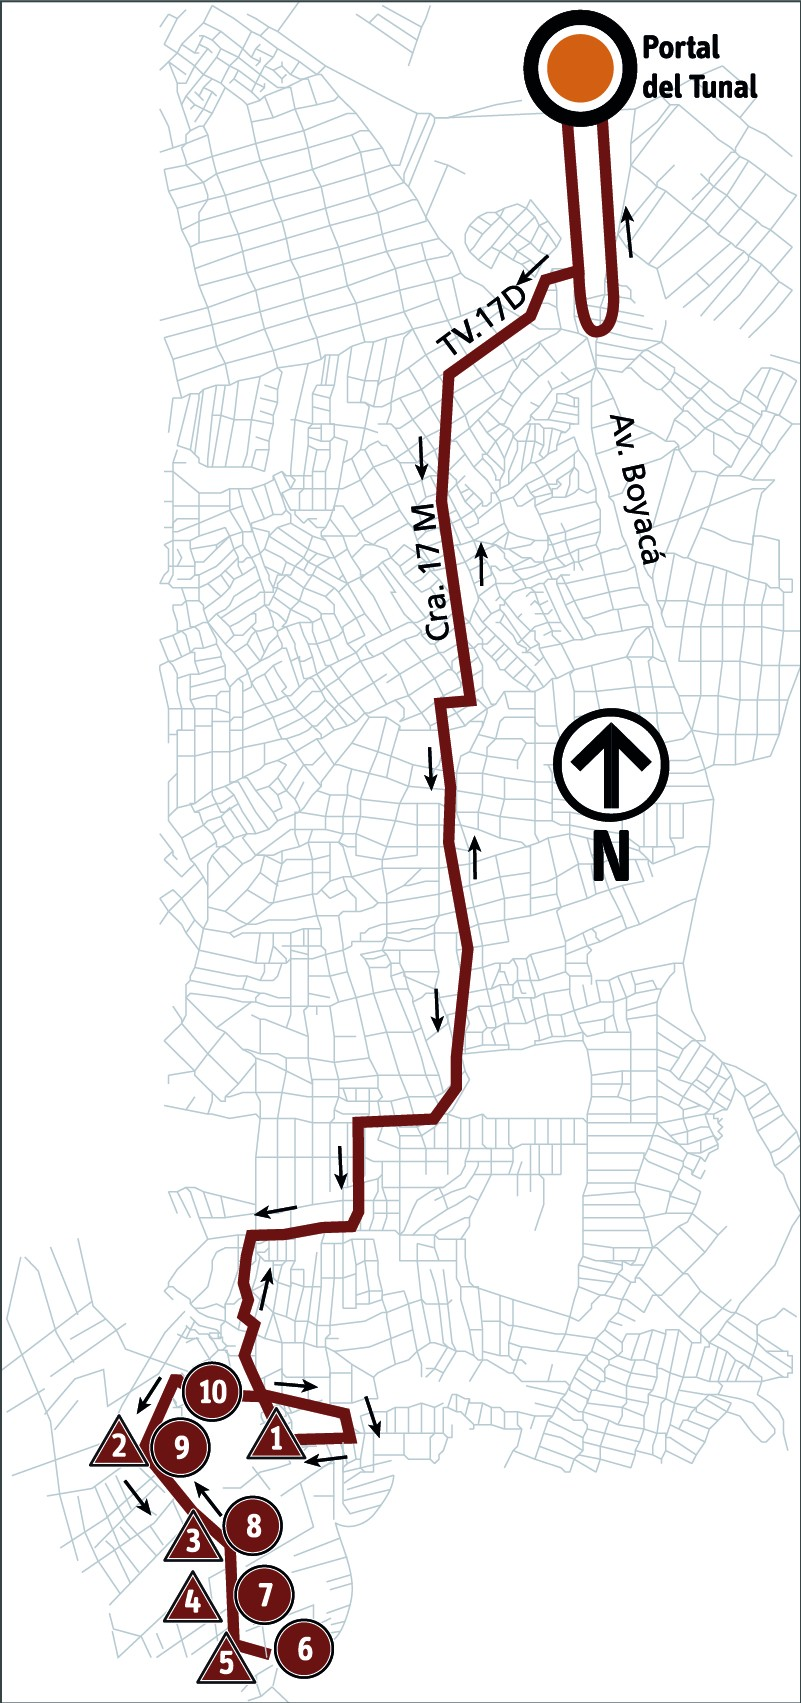 Ruta SITP: 6-5 ➜ Tesoro [Alimentador]